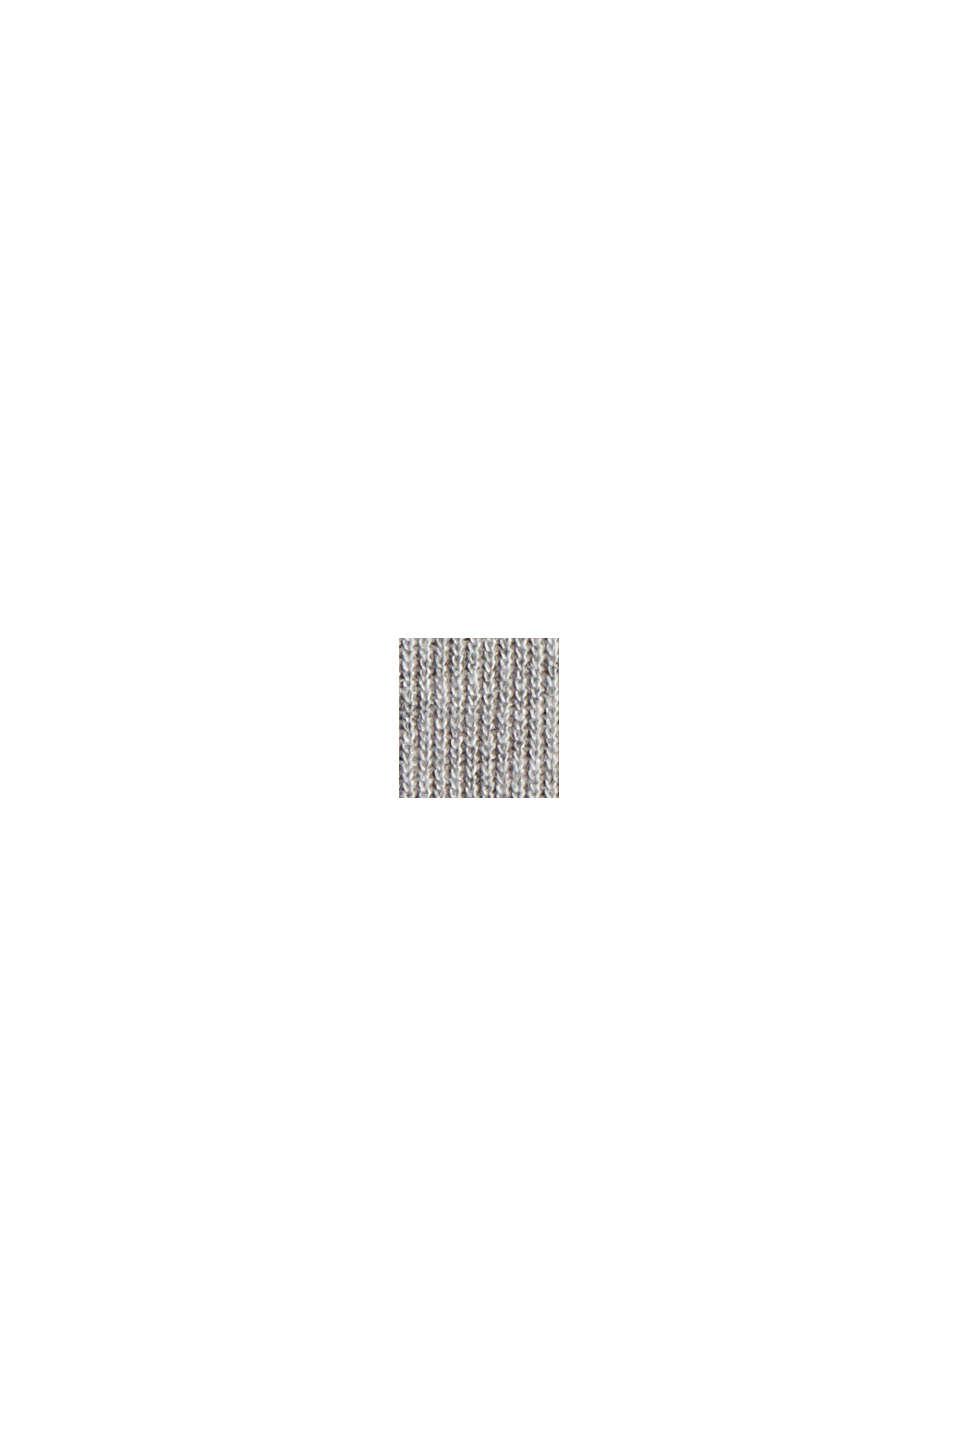 Jersey jurk van TENCEL™ lyocell, LIGHT GREY, swatch